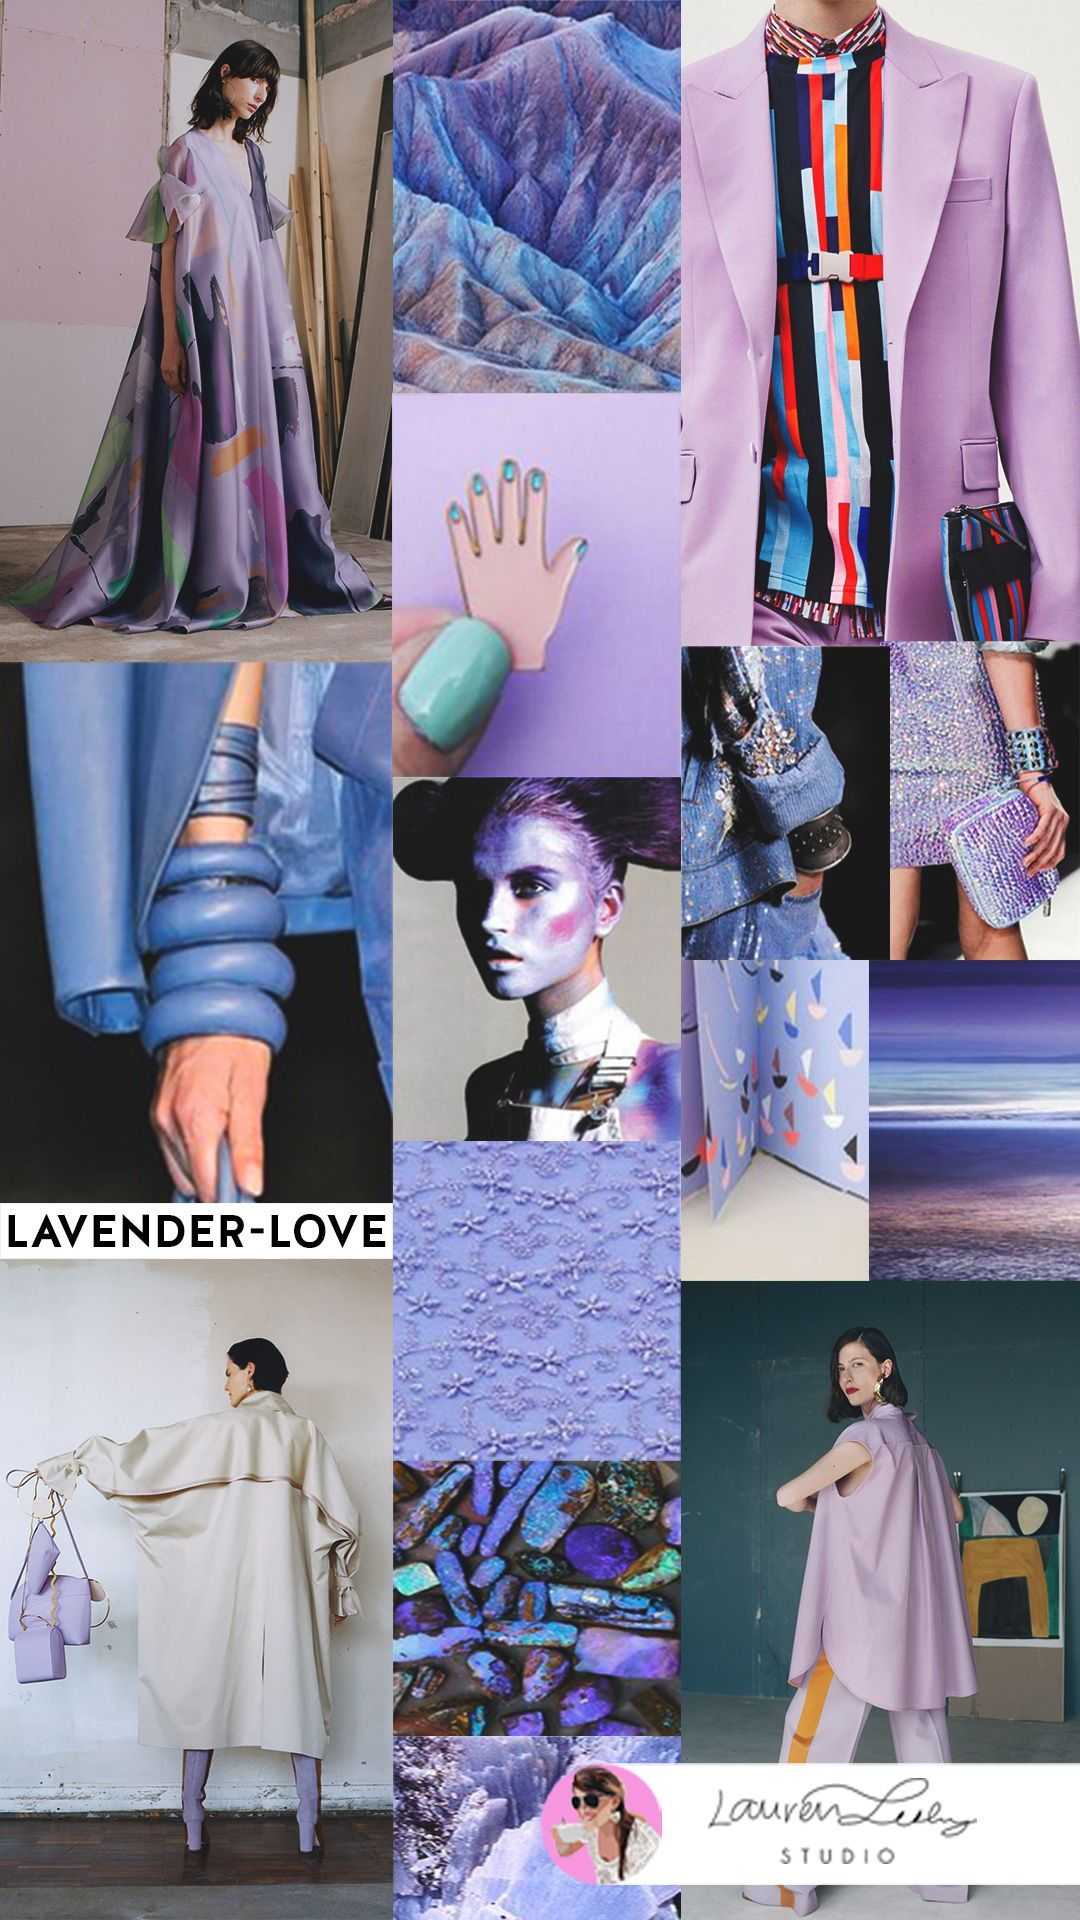 Lavender color in clothes